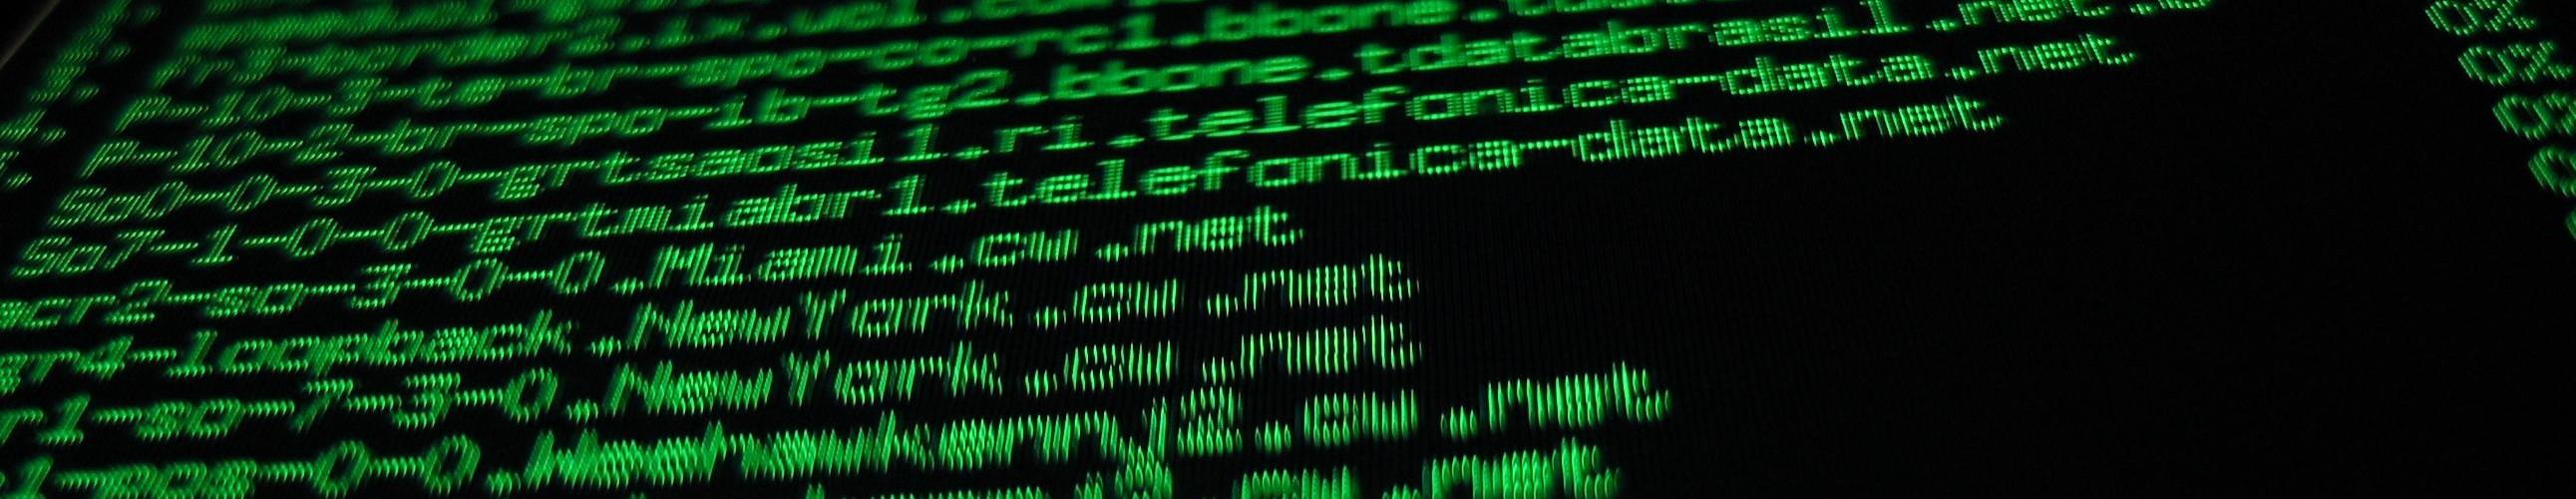 hacker-terminal